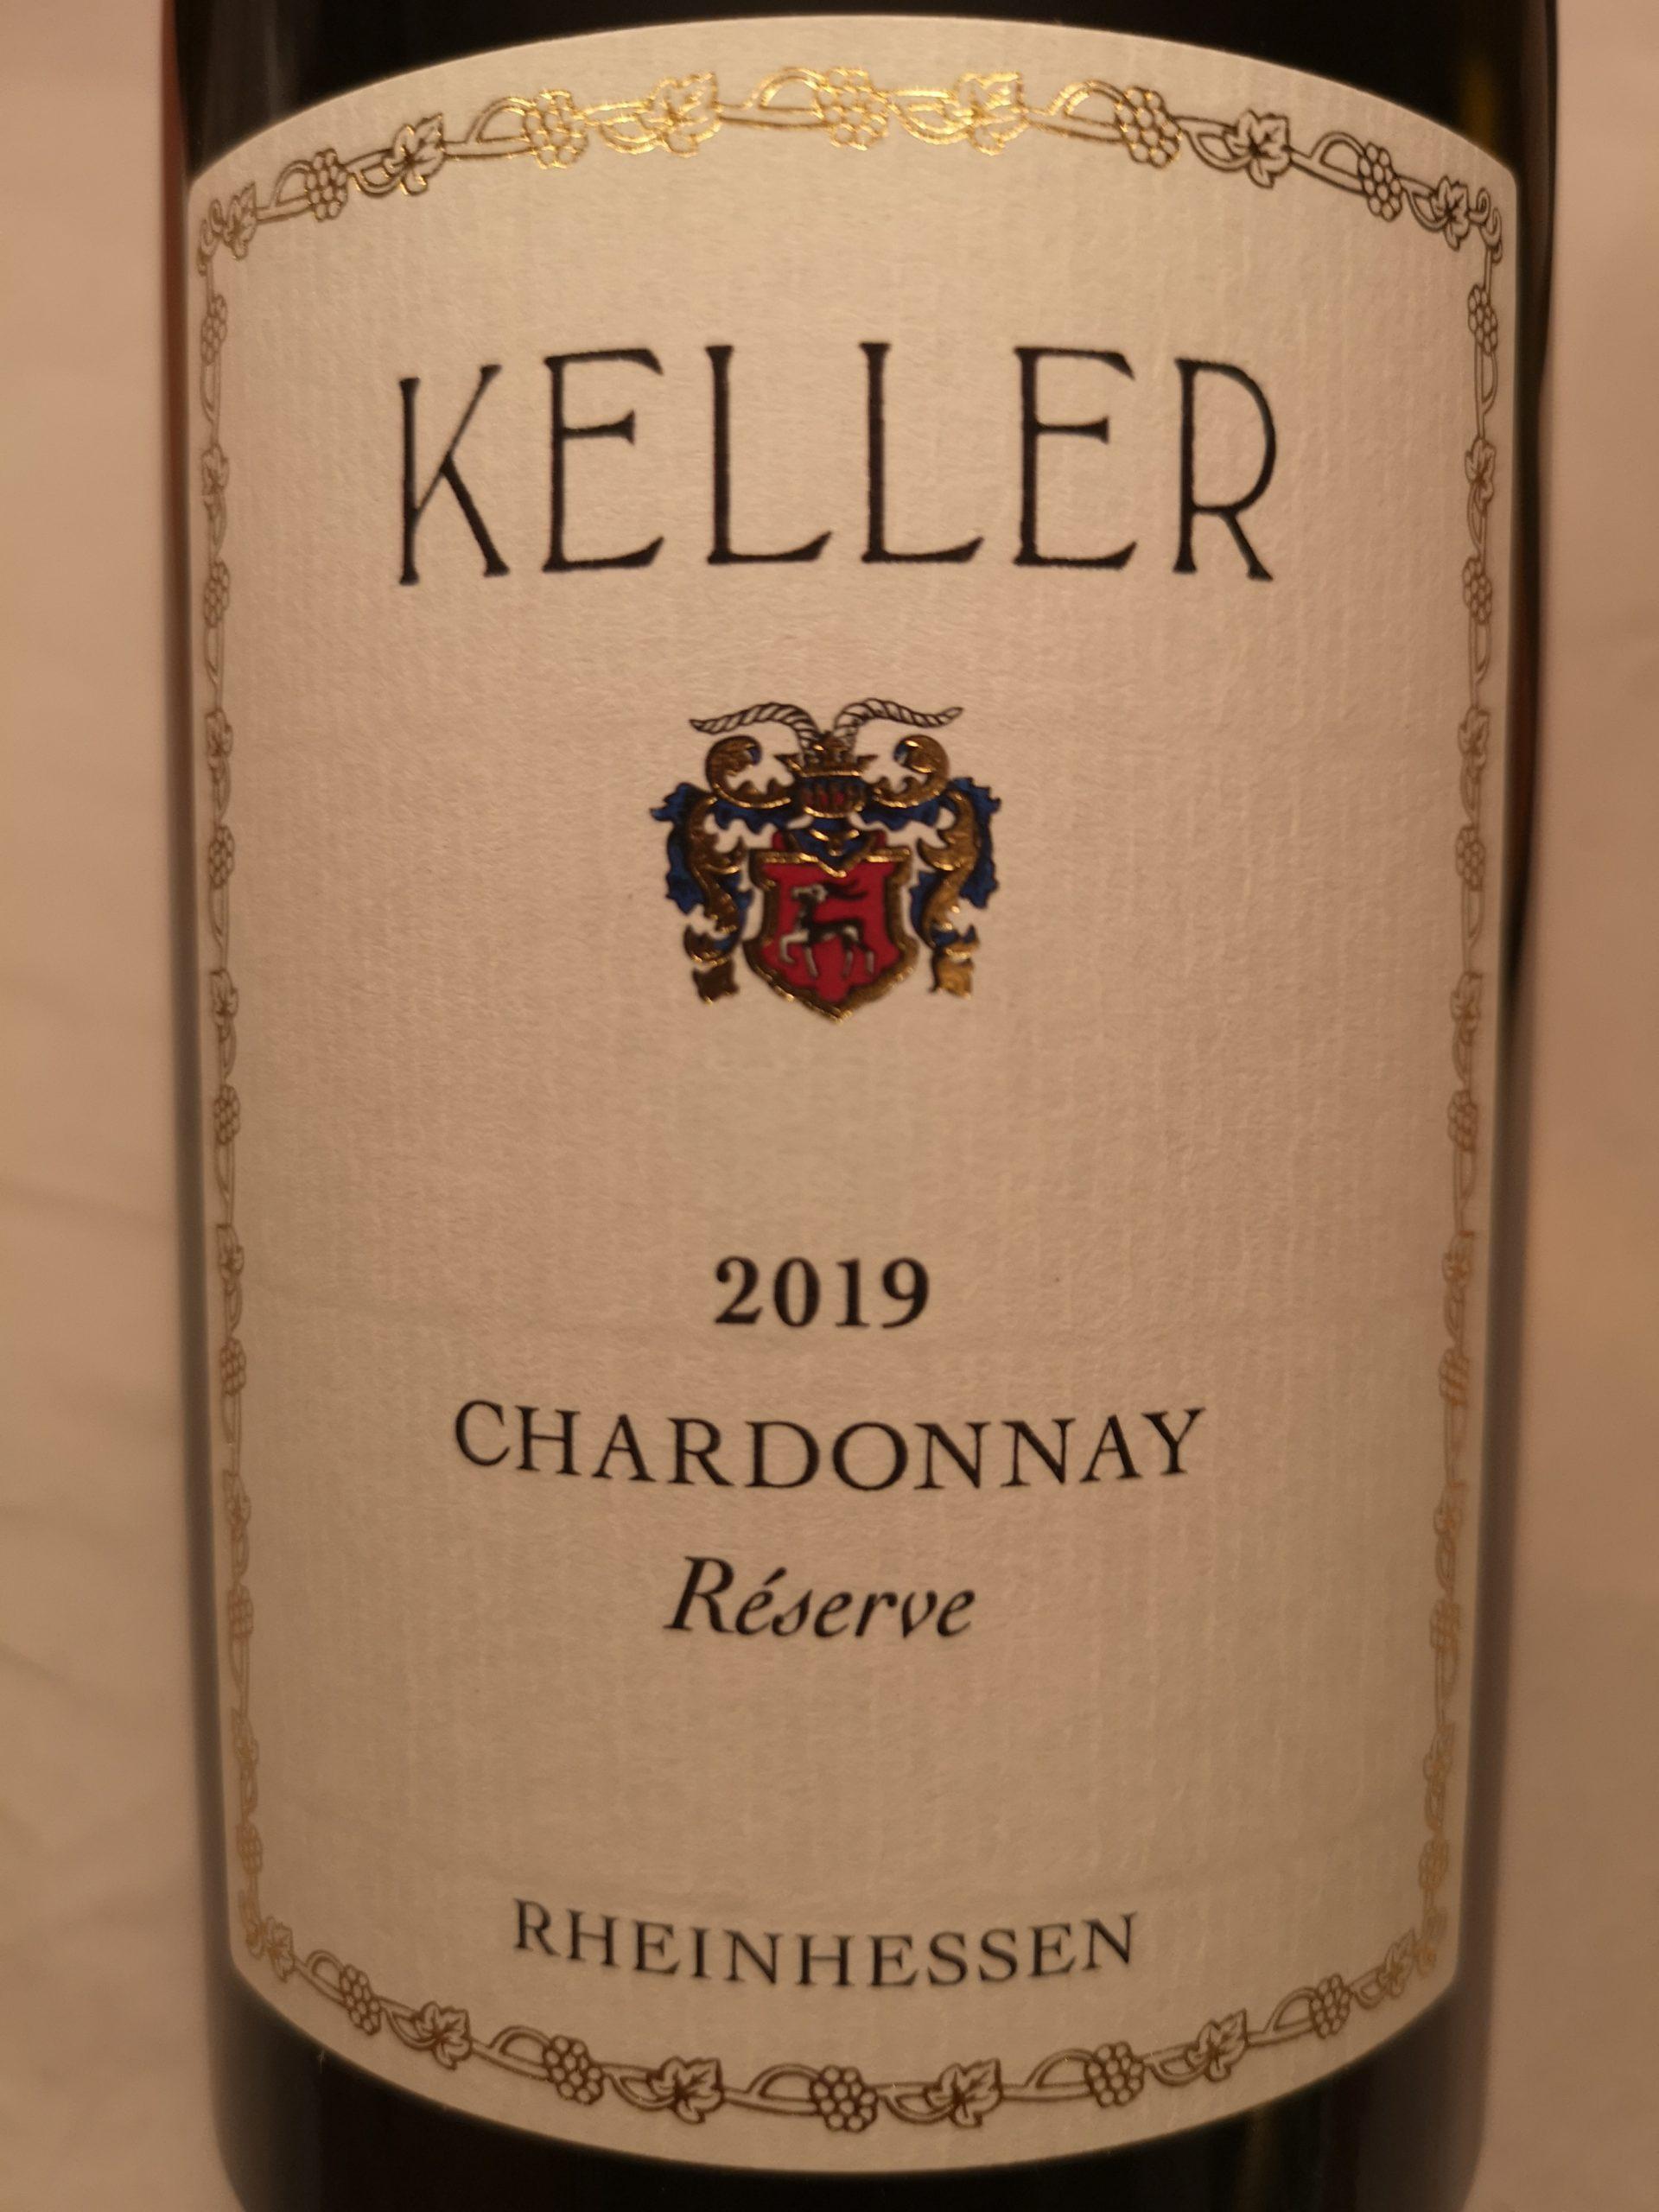 2019 Chardonnay Reserve | Keller